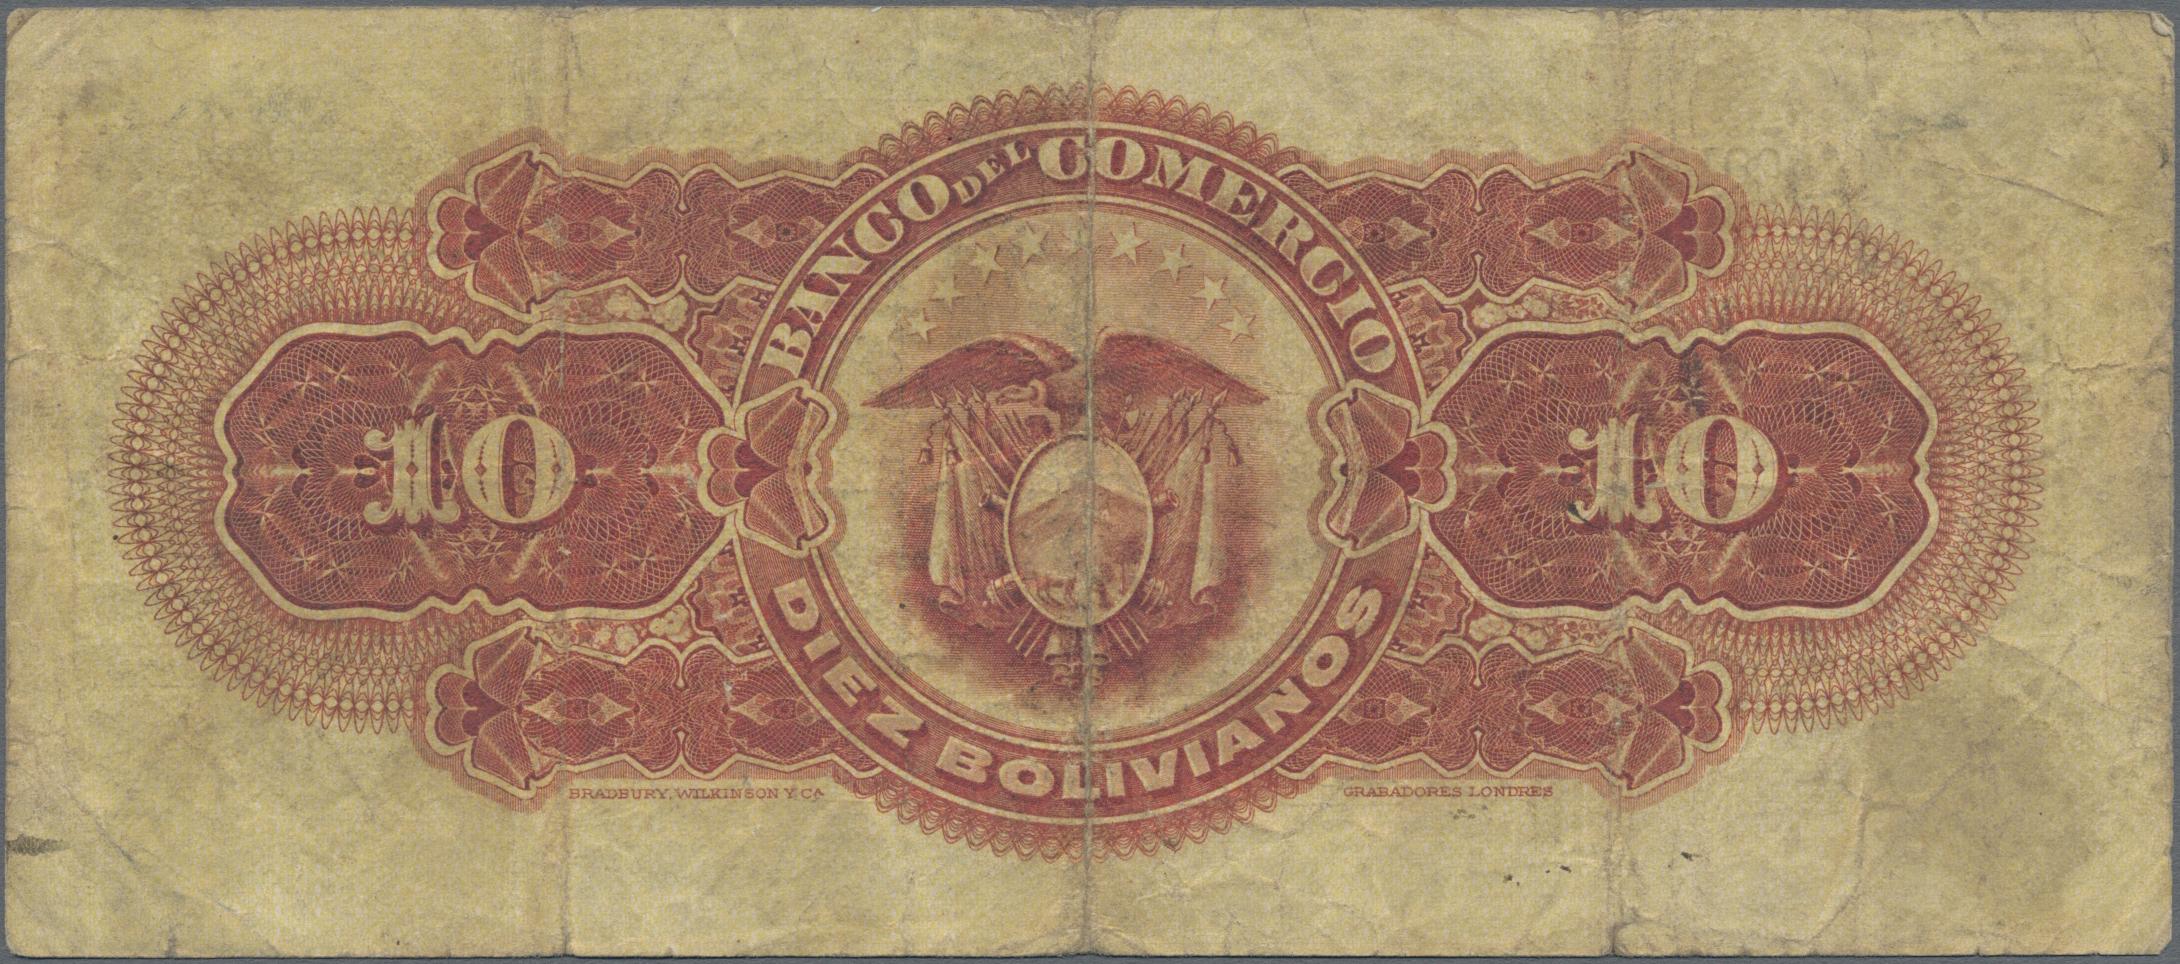 Lot 00064 - Bolivia / Bolivien | Banknoten  -  Auktionshaus Christoph Gärtner GmbH & Co. KG Sale #48 The Banknotes